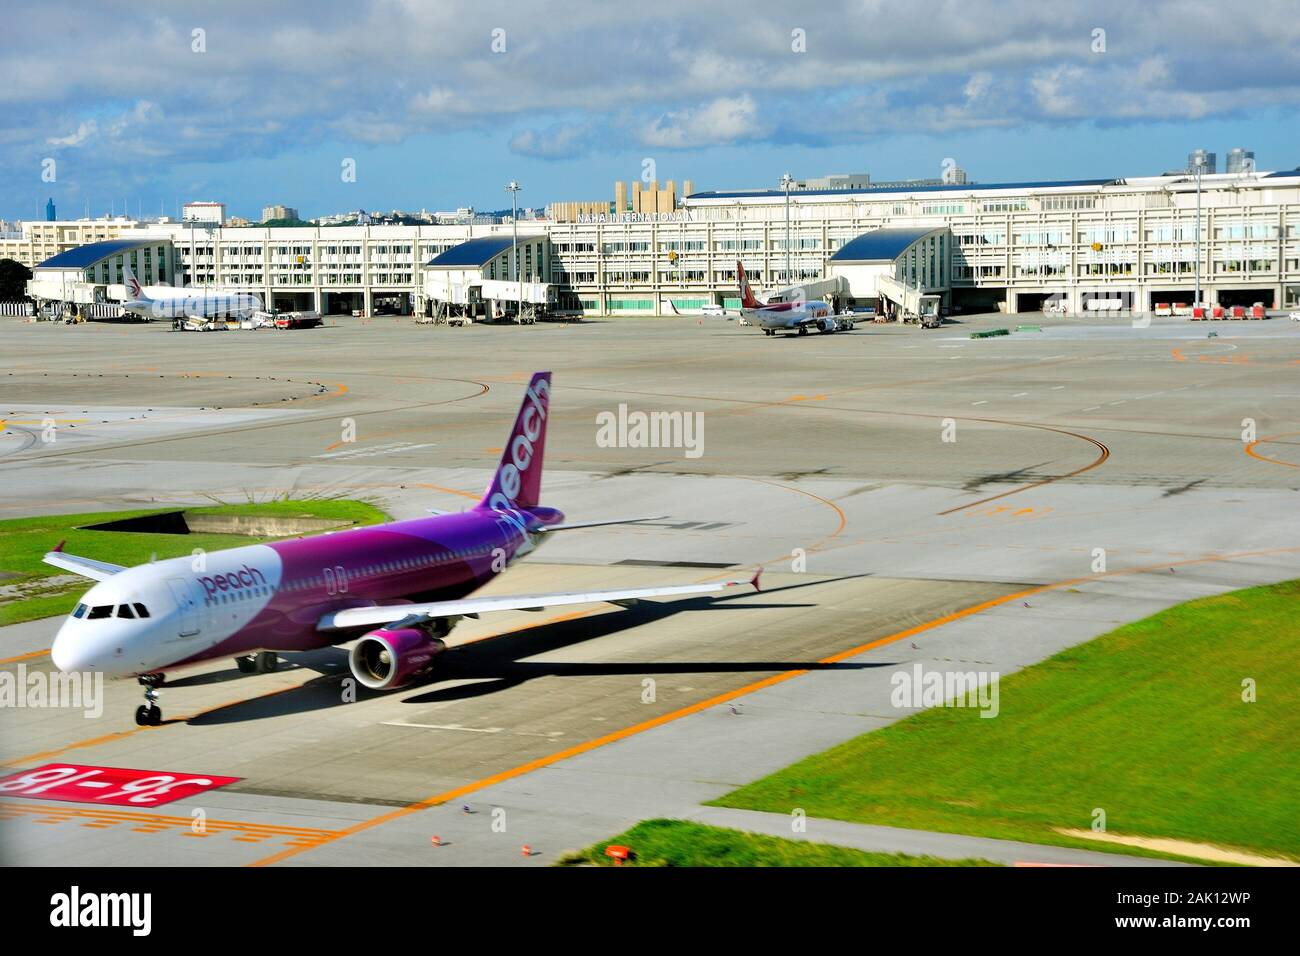 Aeropuerto De Naha (Roha), Aéreo, Con Peach Aviation Airbus, A320, Esperando Salida, Naha, Okinawa, Japón Foto de stock